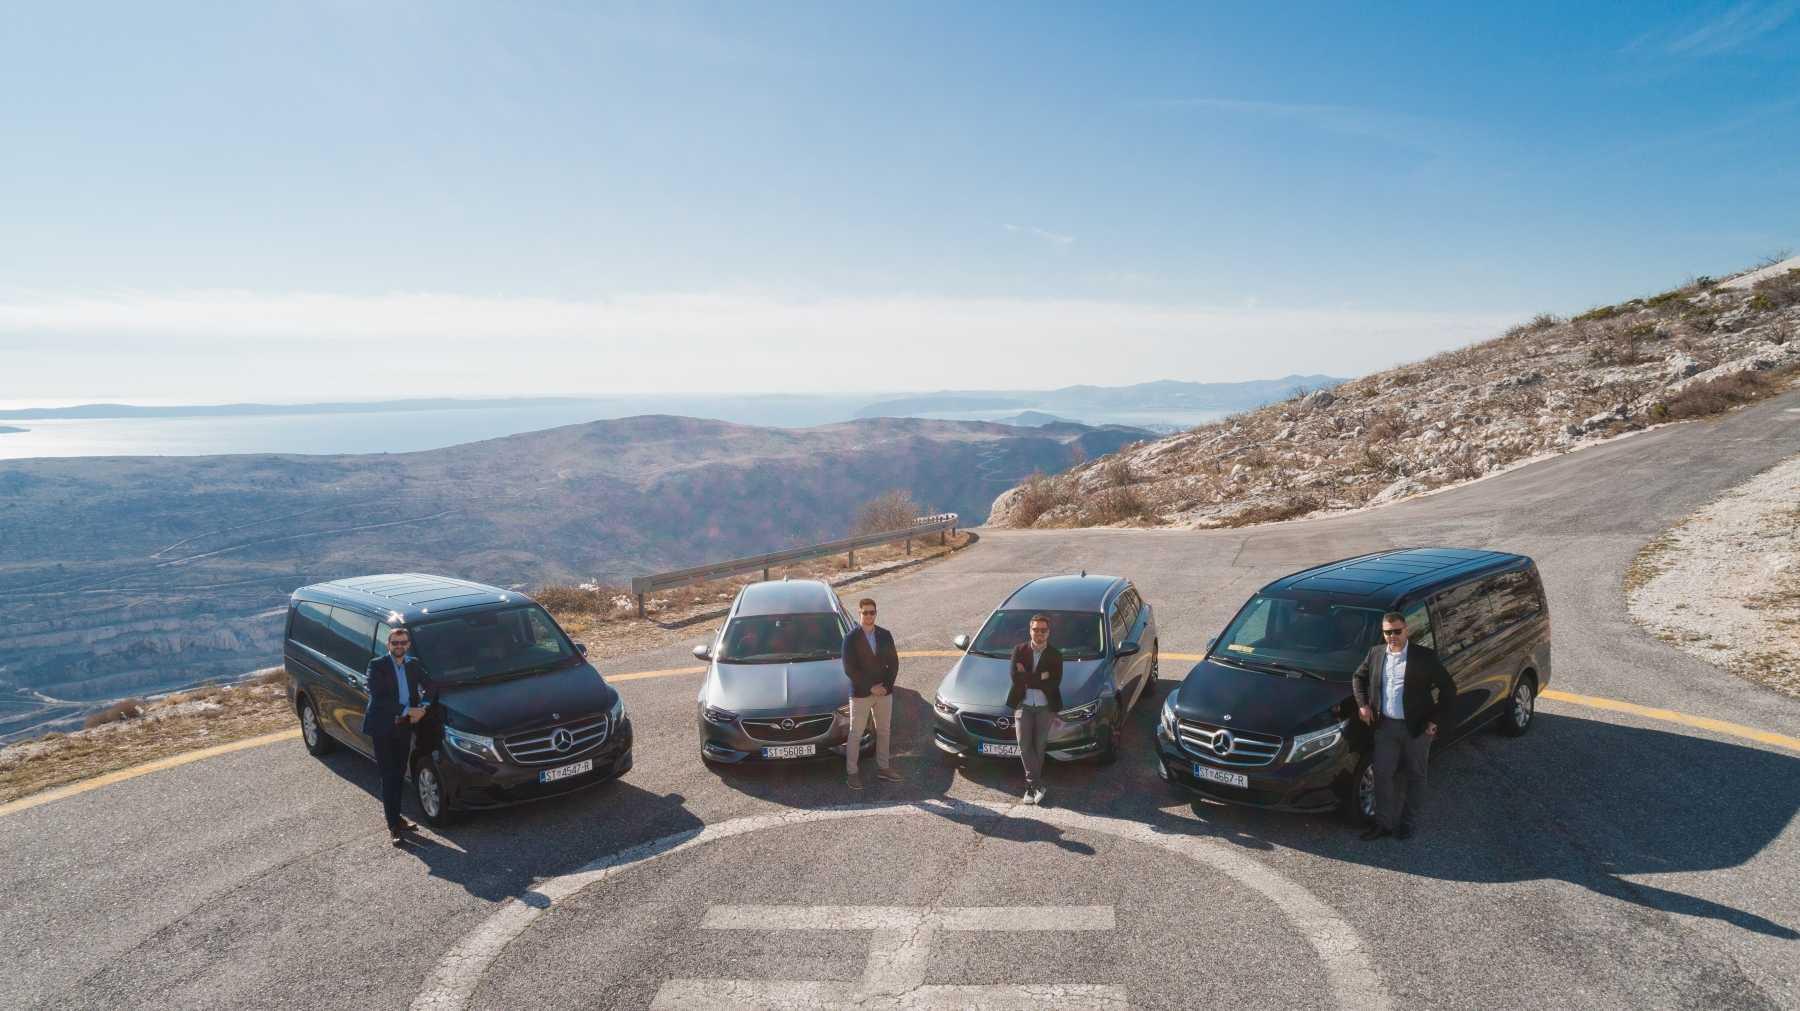 croatia private tours - english speaking professional drivers